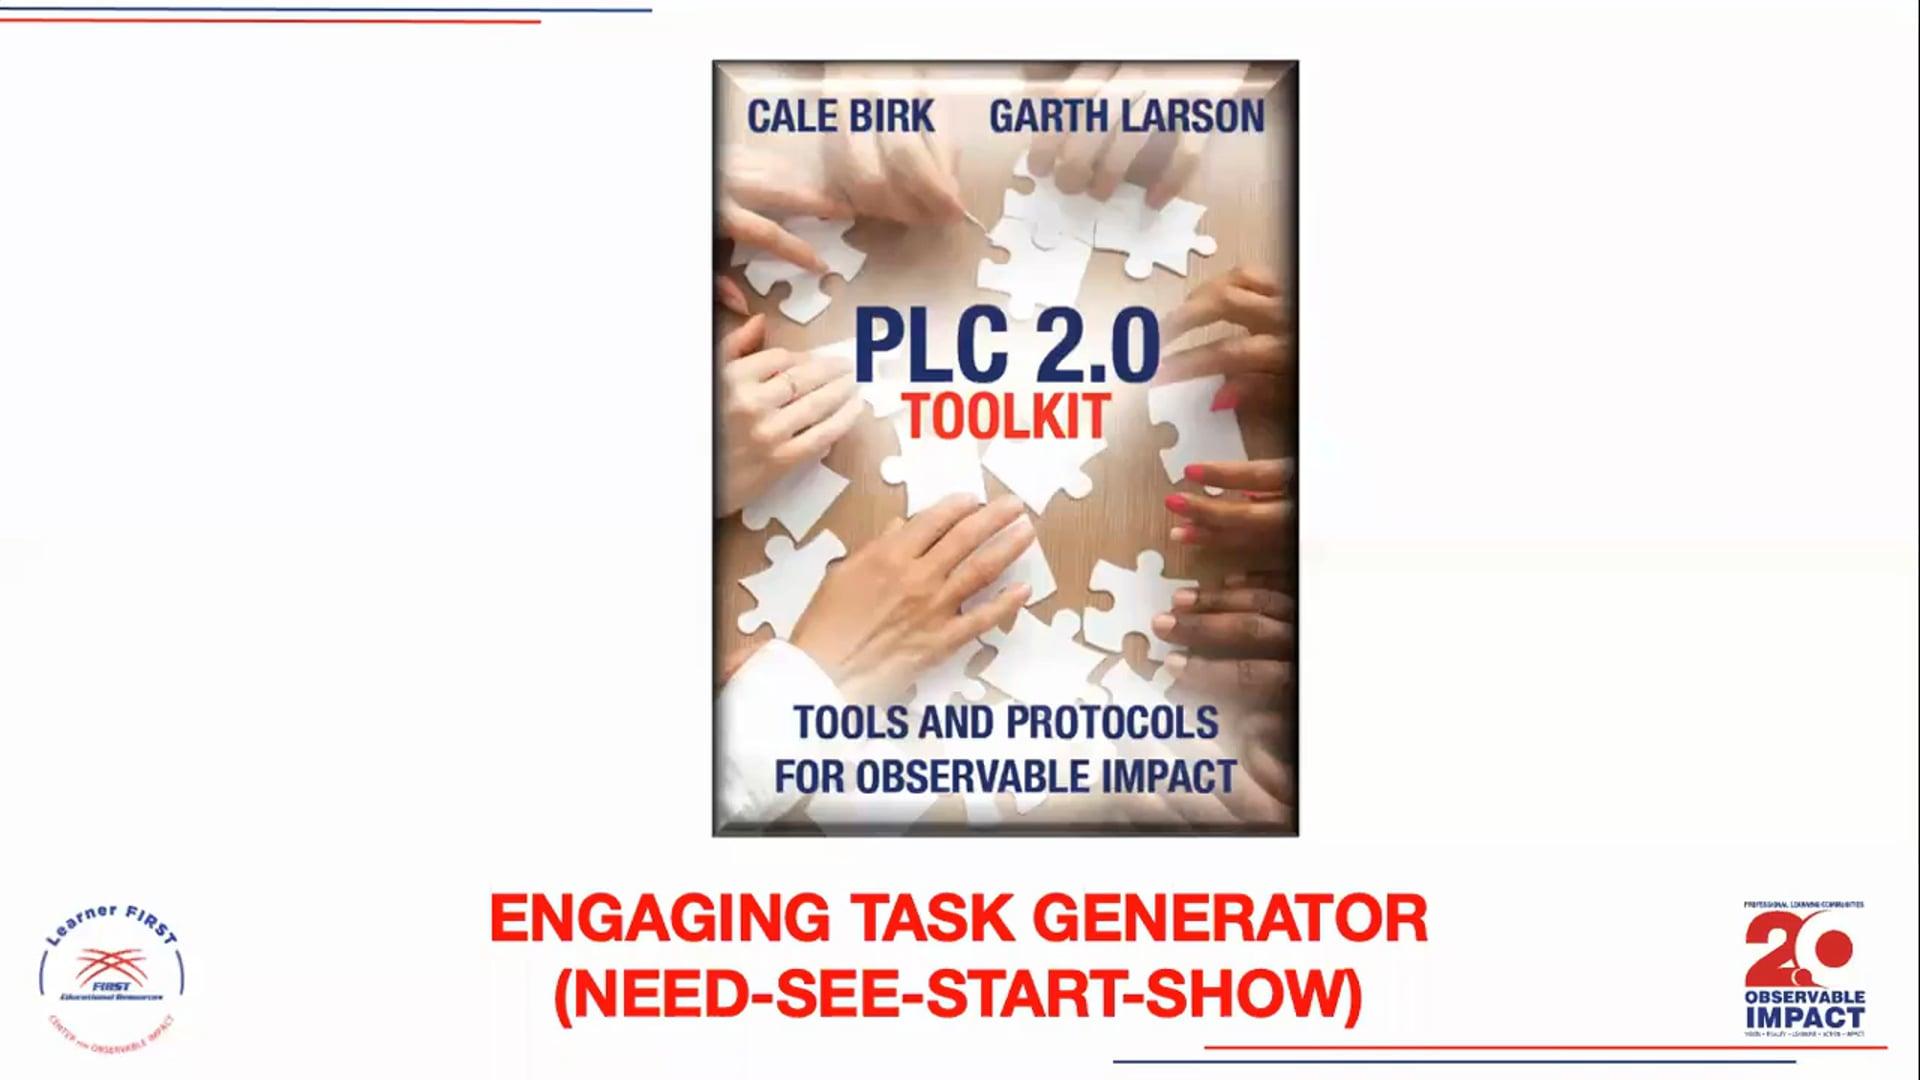 PLC 2.0 - Engaging Task Generator